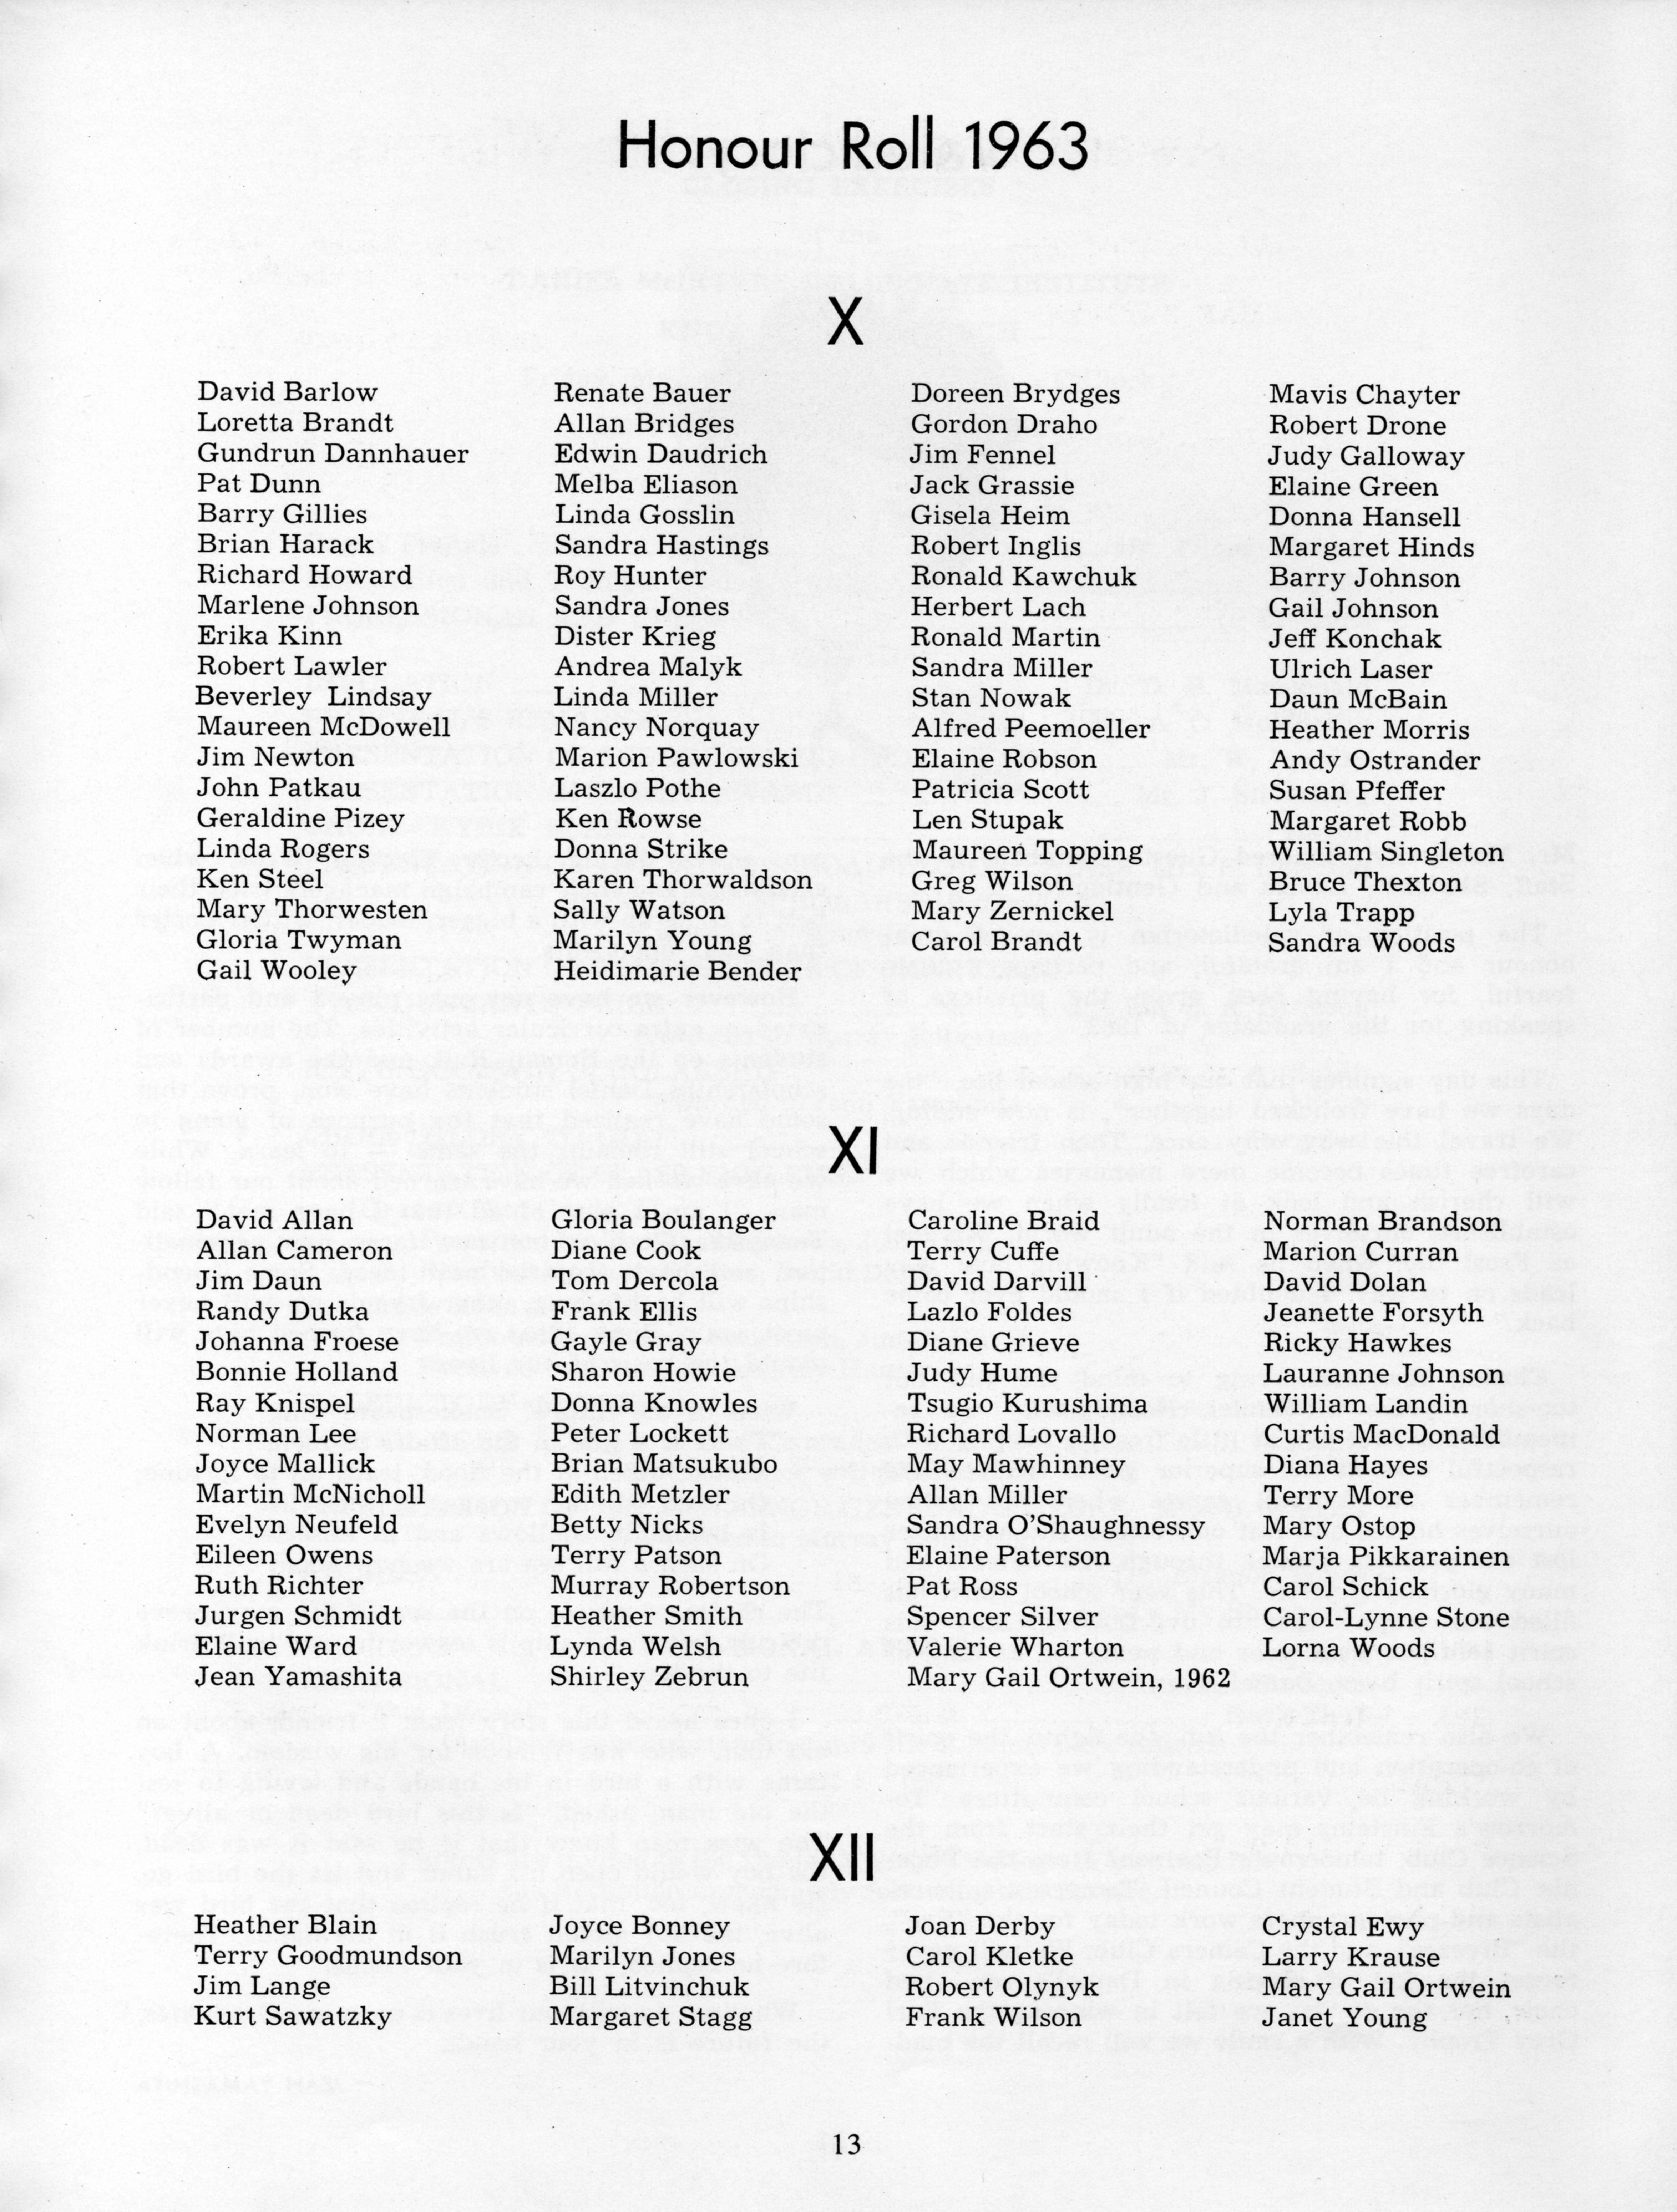 Download Dmci Breezes, 19621963, Page 13, Honour Roll